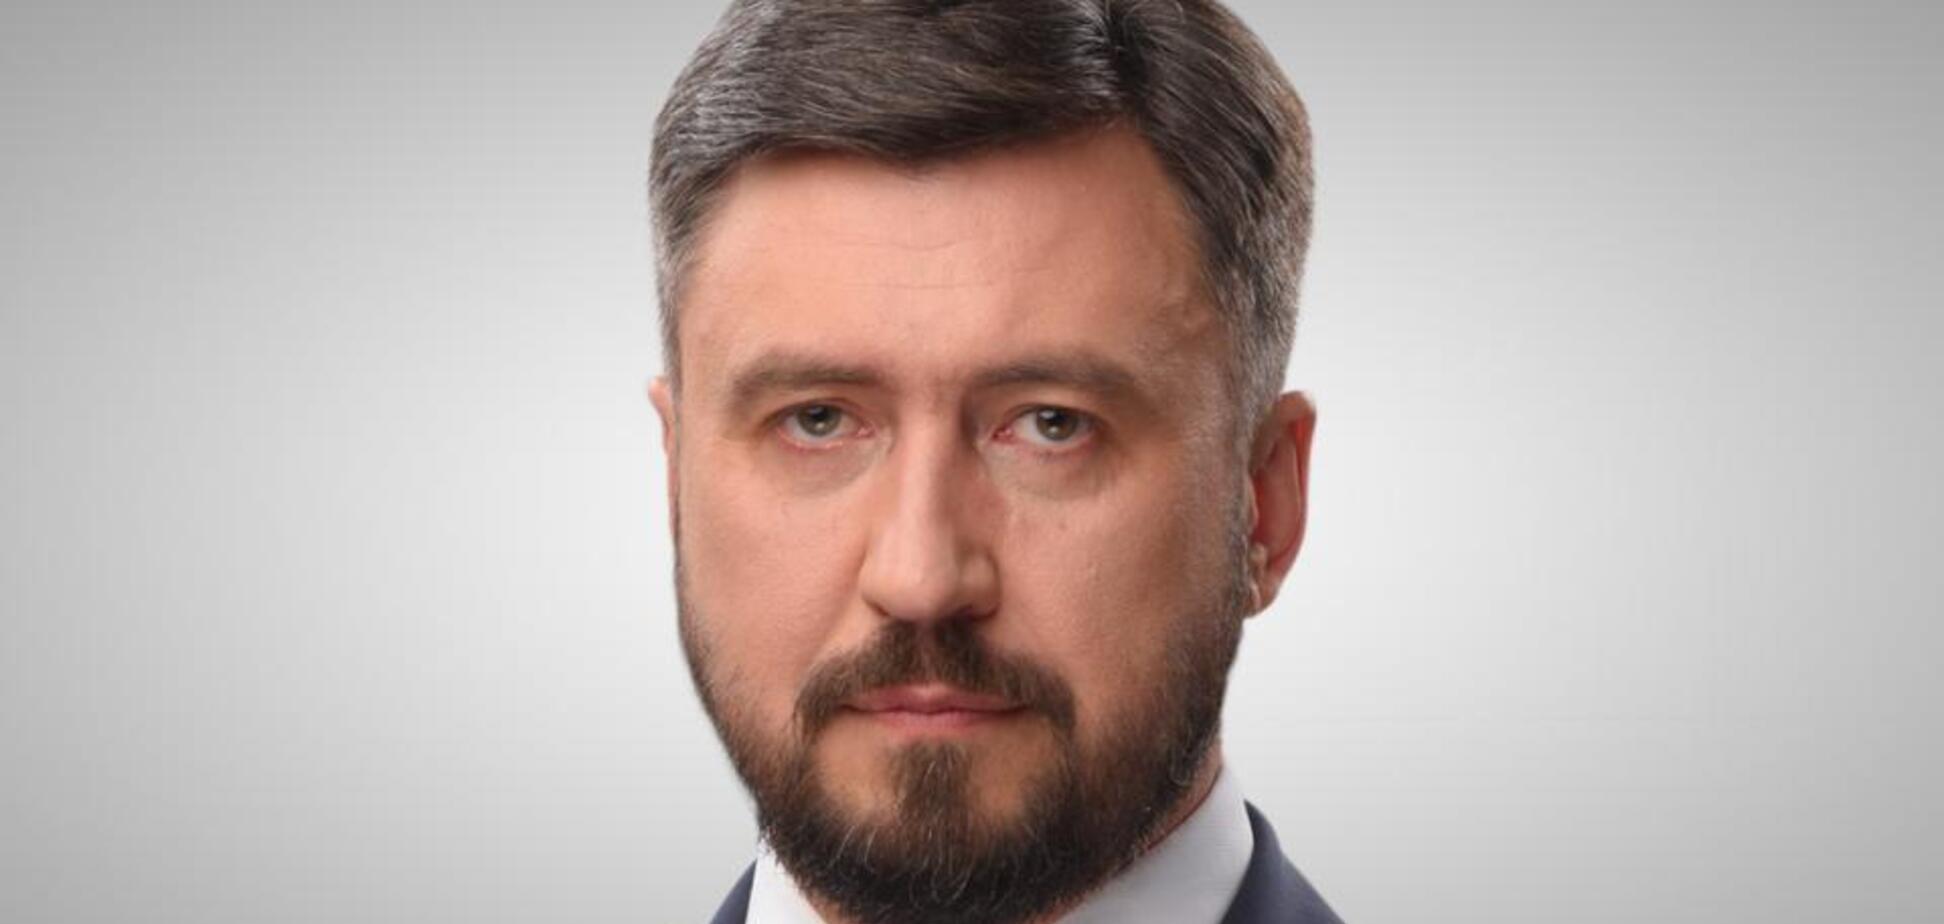 Програма Соловйова на вибори президента